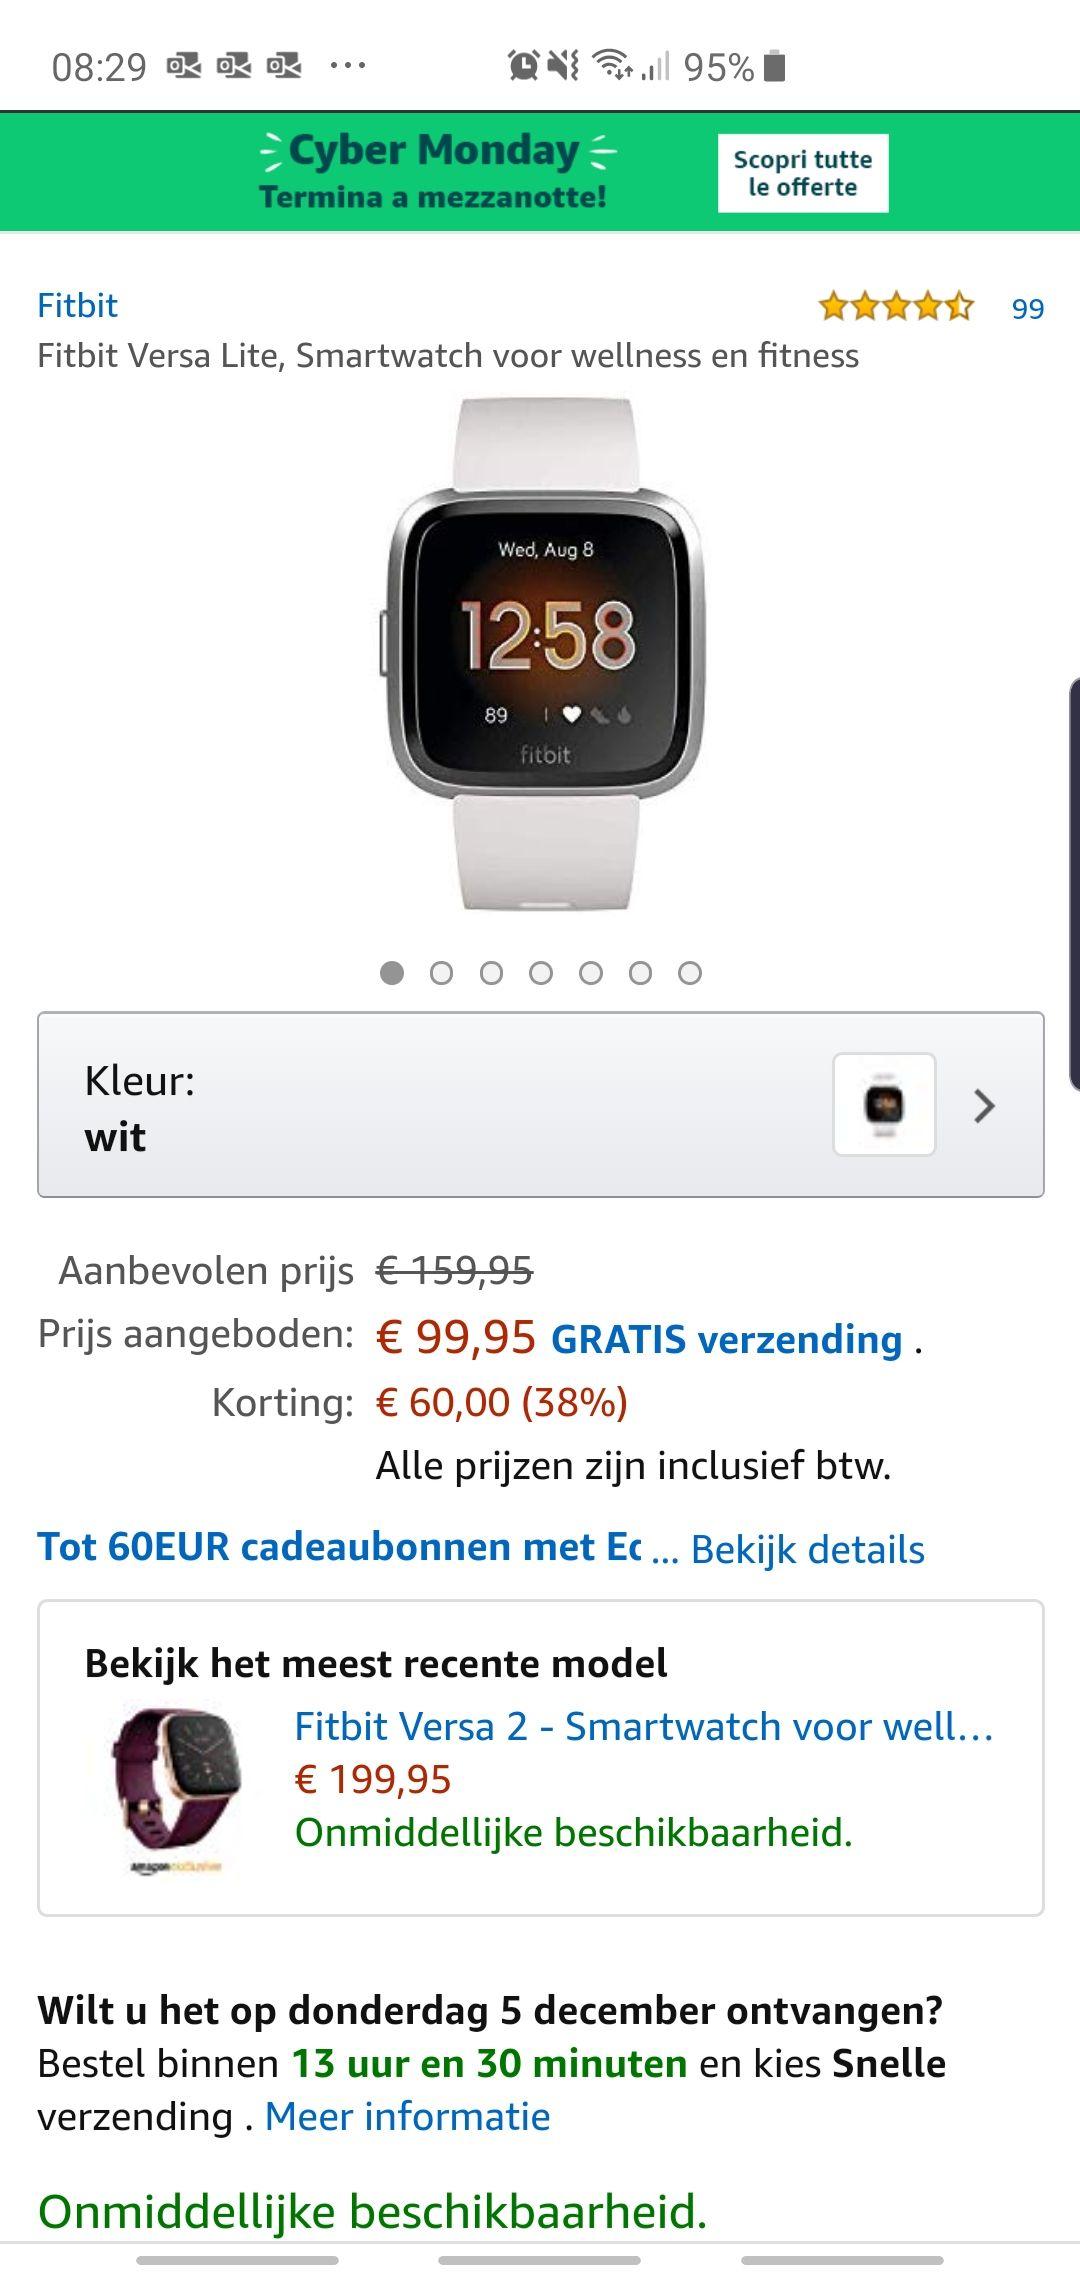 Cyber Monday, Fitbit Versa Lite